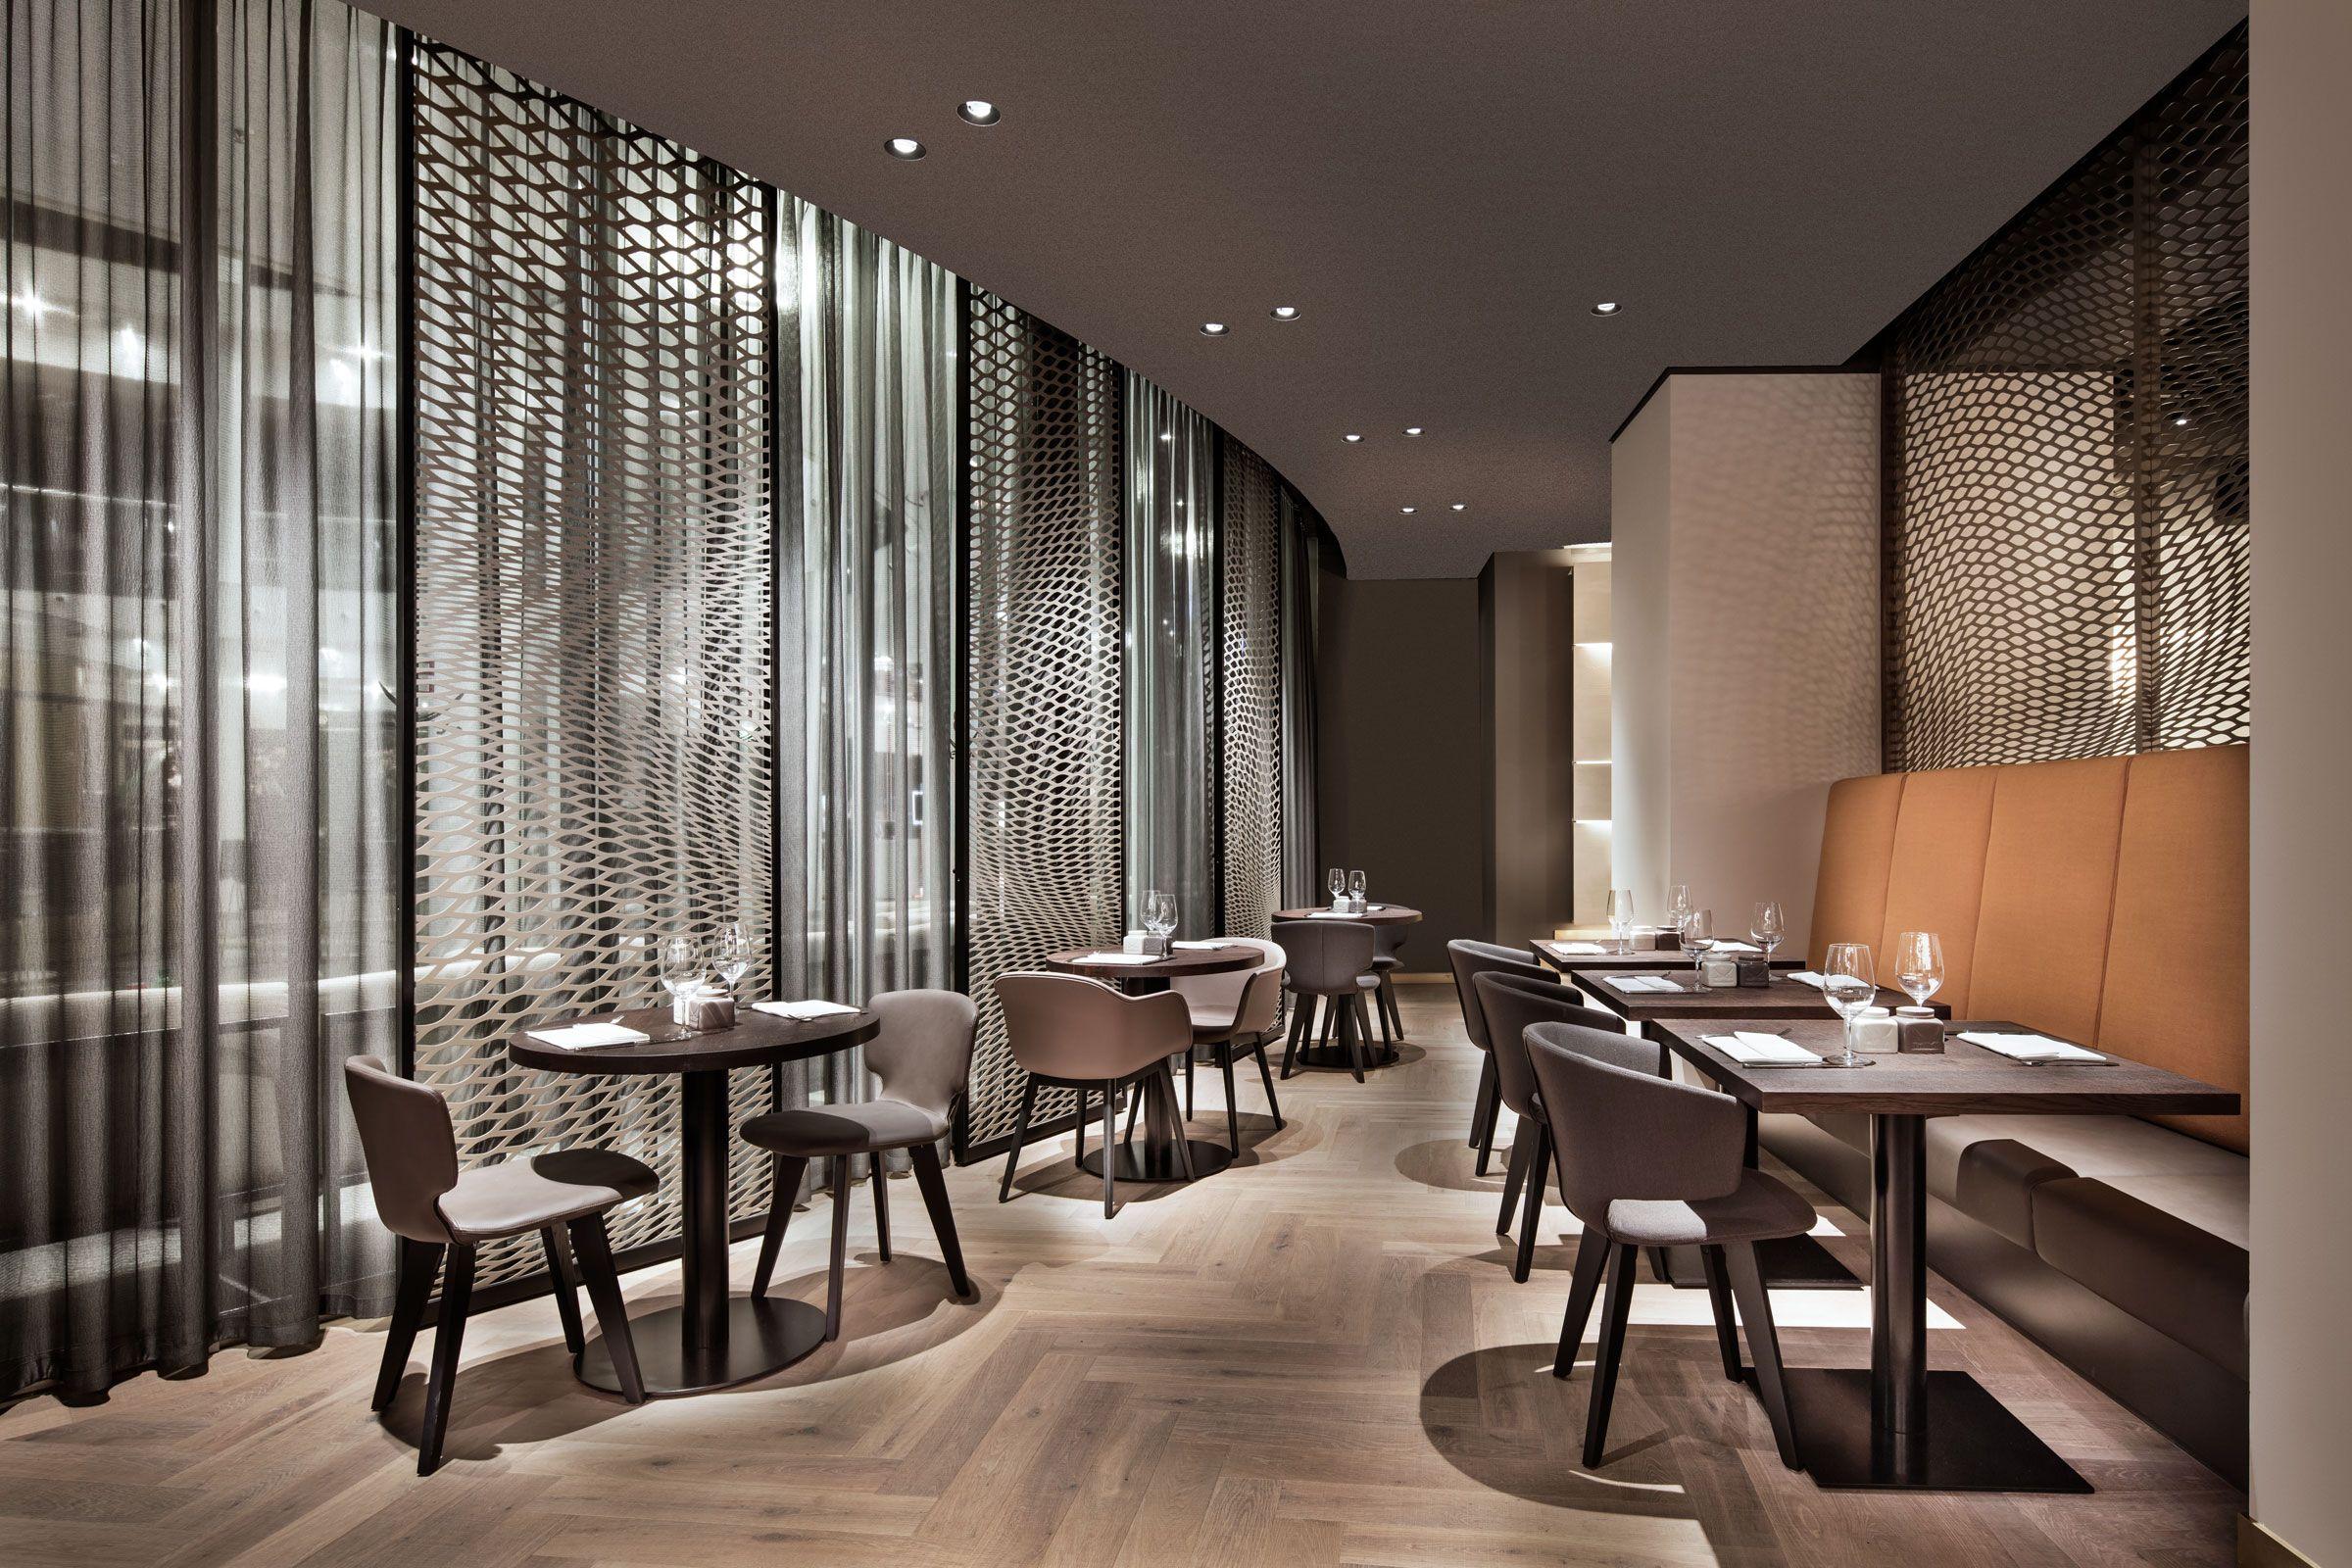 Möbeldesign Stuttgart interior design architecture sansibar stuttgart by dia dittel